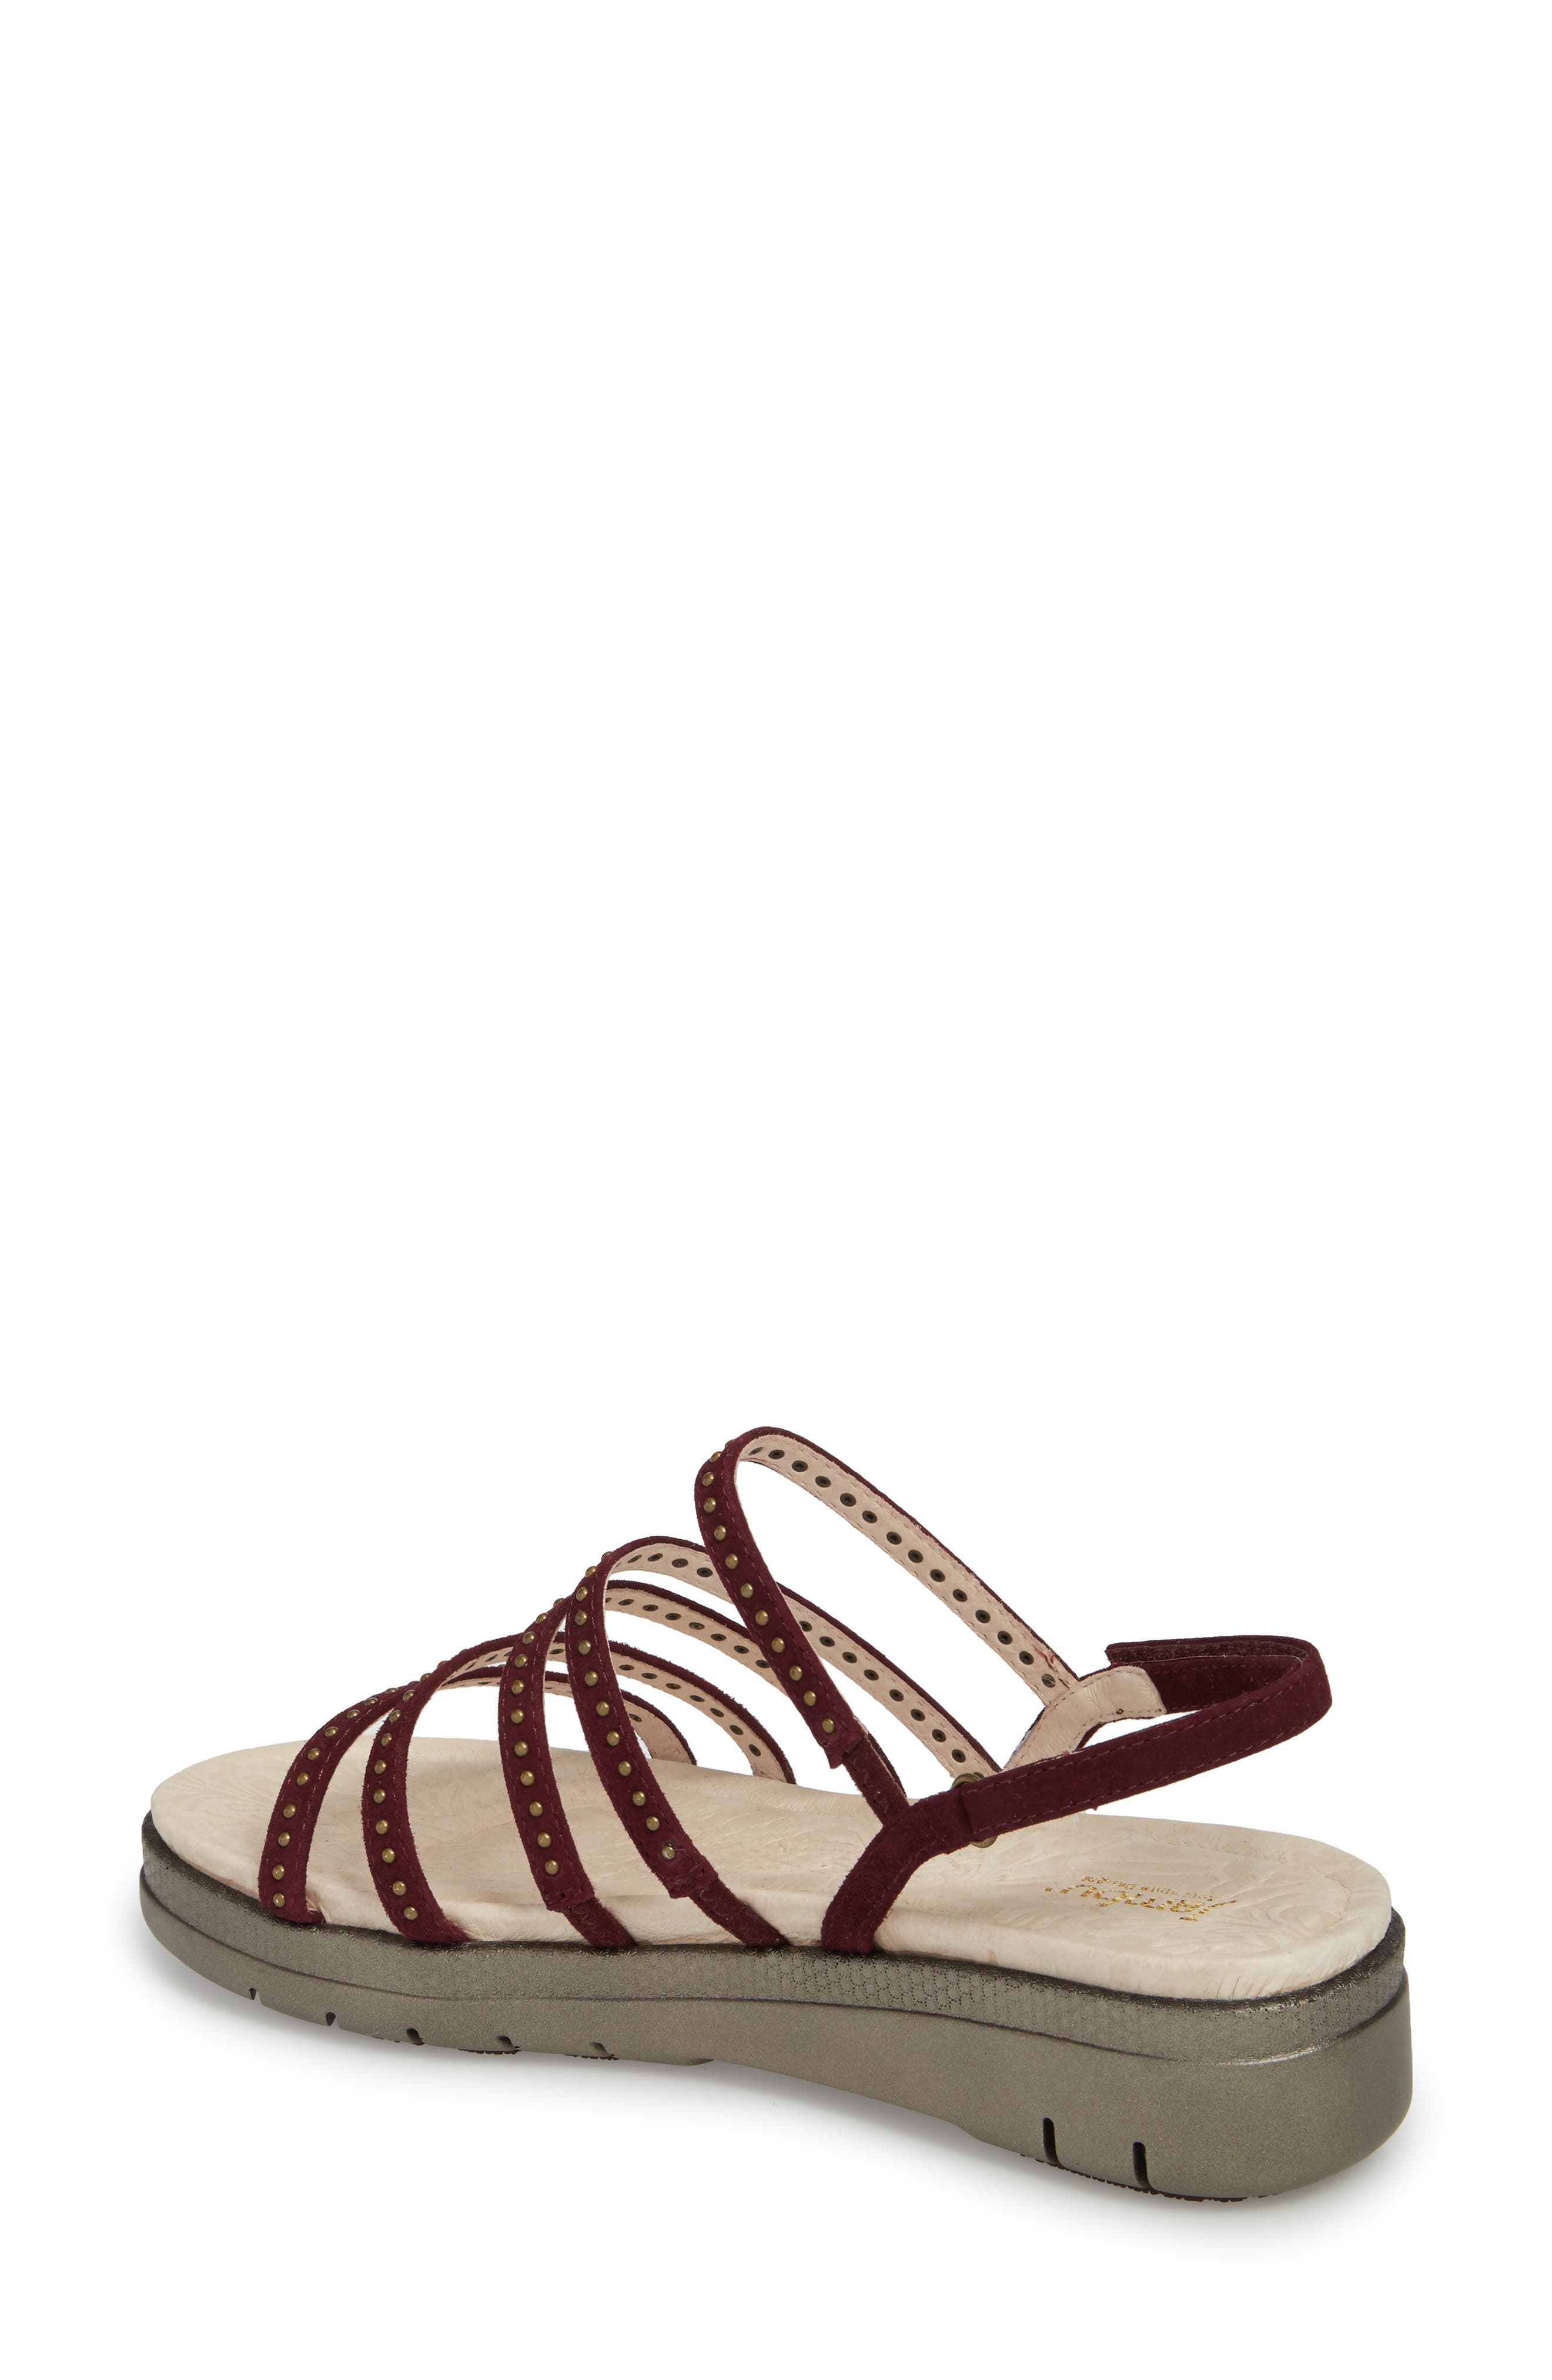 Elegance Studded Strappy Sandal,                             Alternate thumbnail 2, color,                             WINE SUEDE